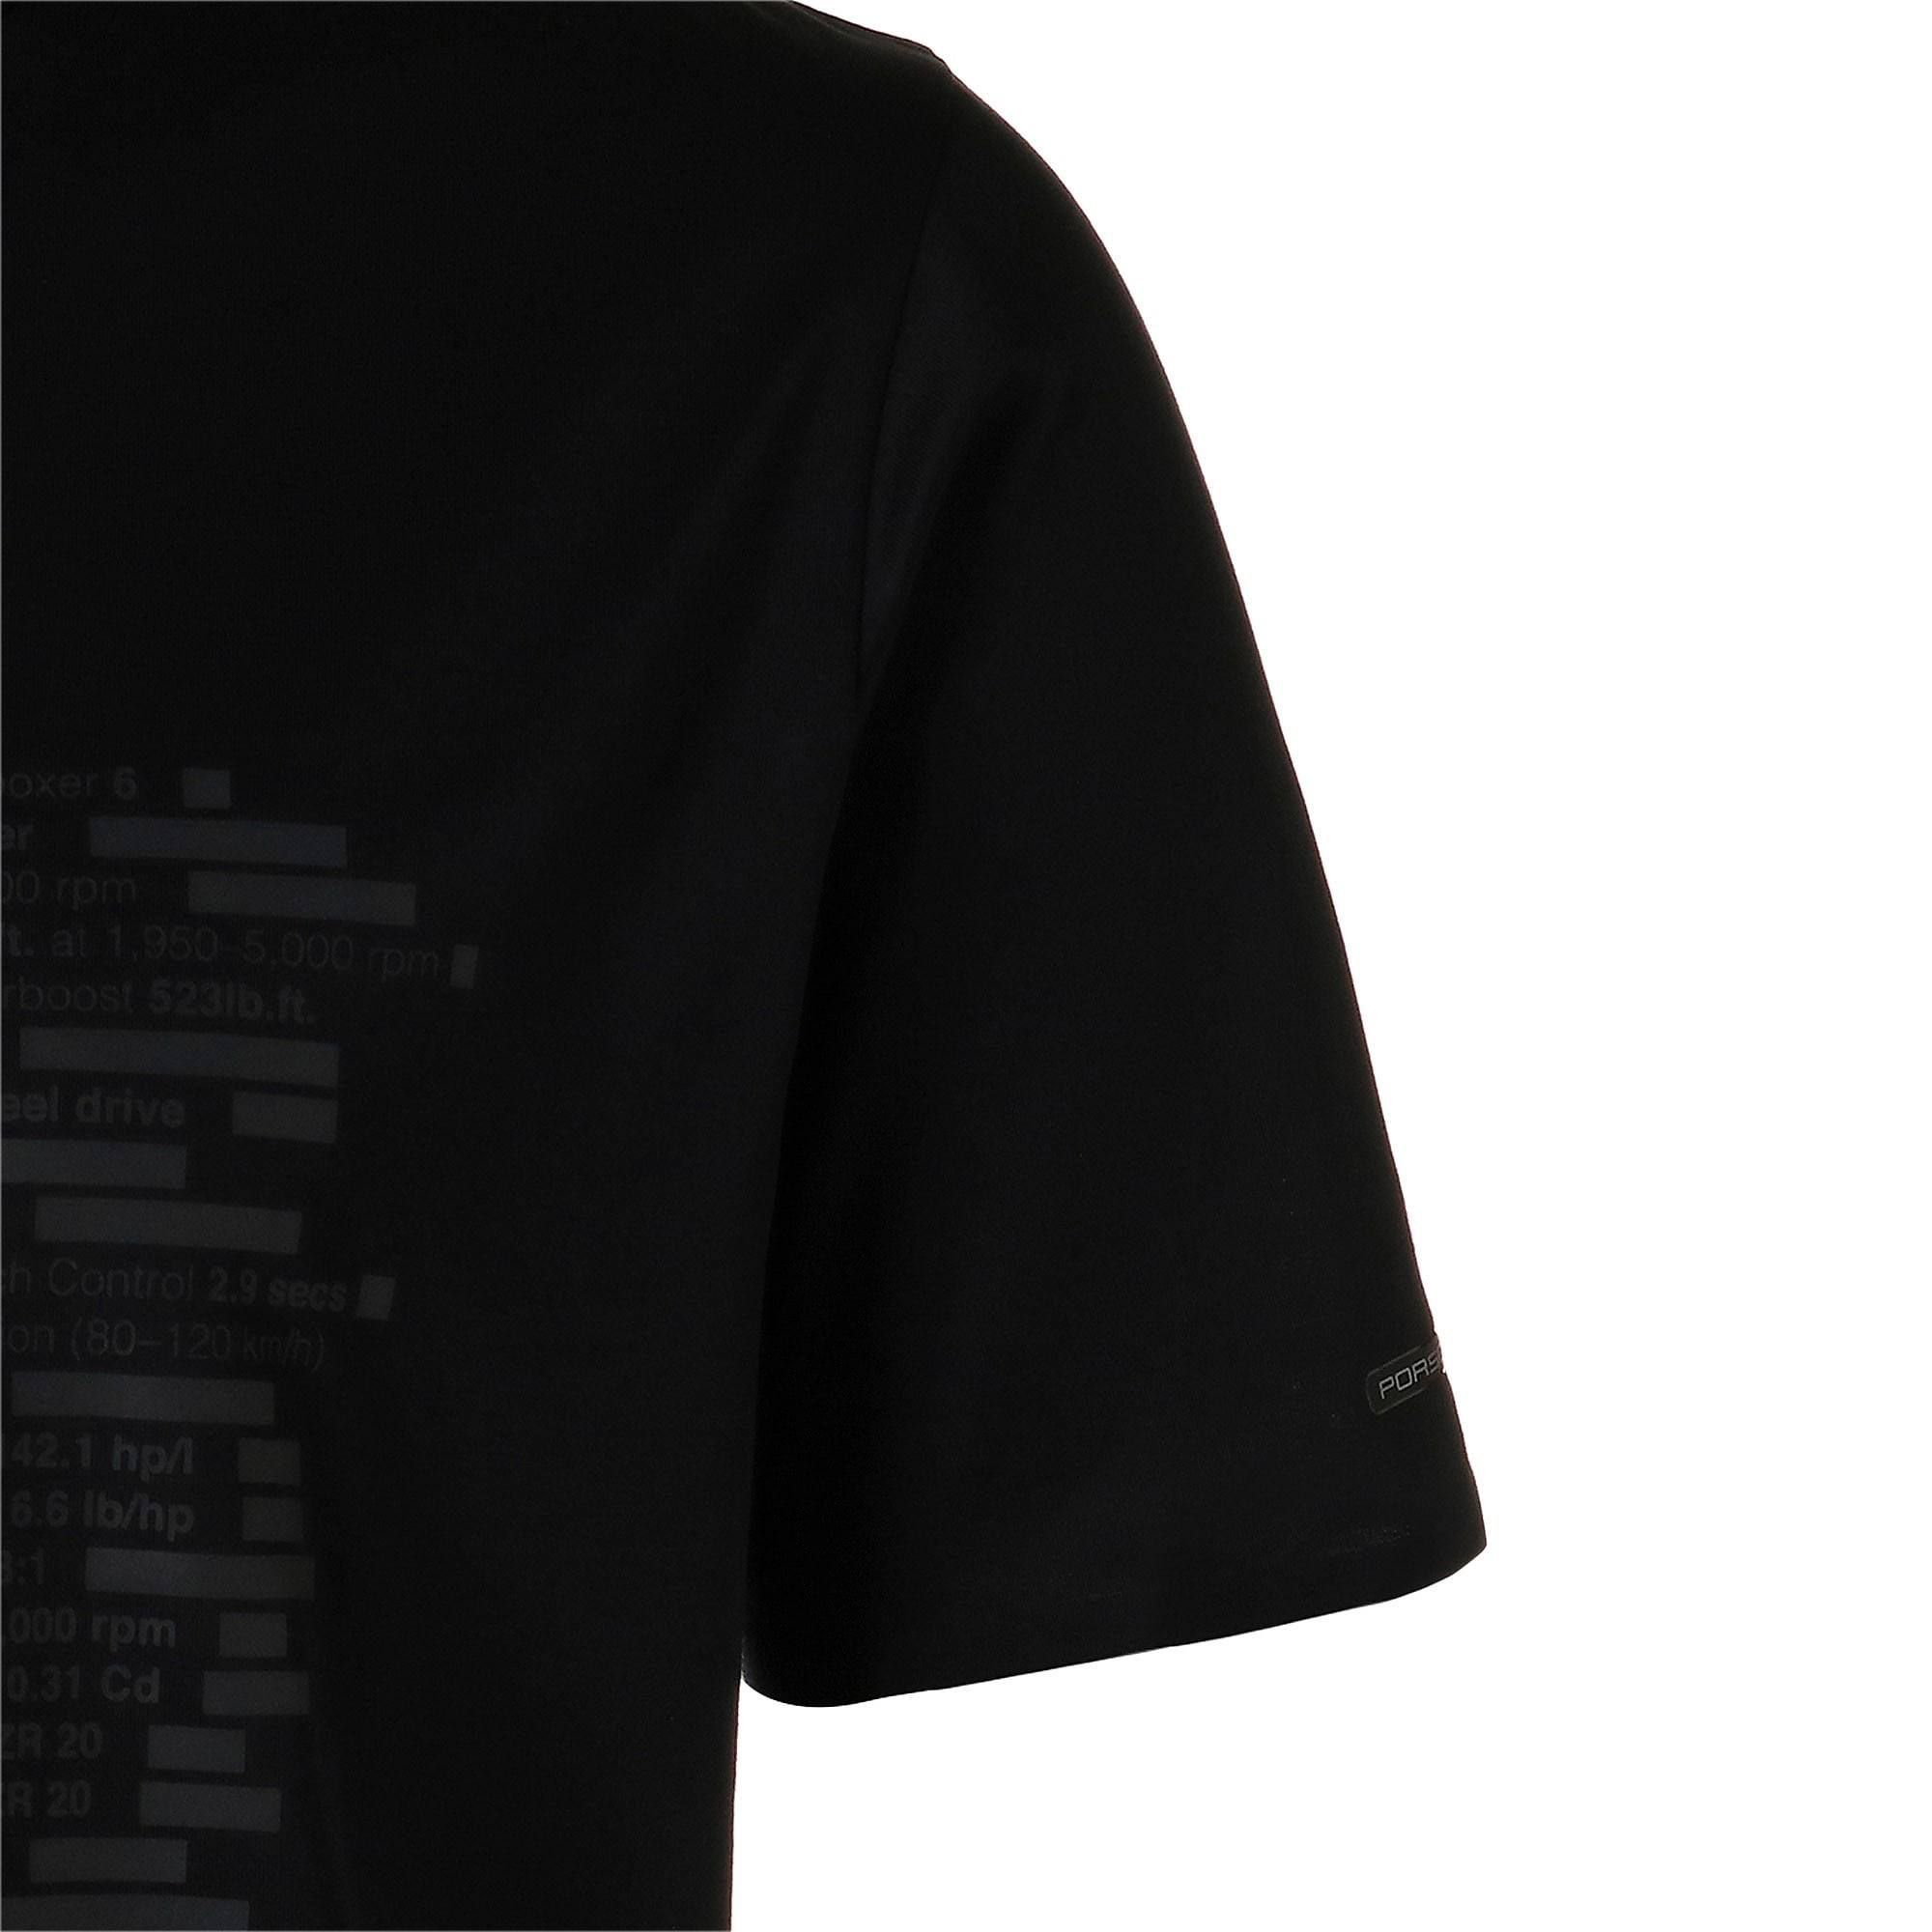 Thumbnail 5 of M ポルシェデザイン PD グラフィック Tシャツ, Jet Black, medium-JPN